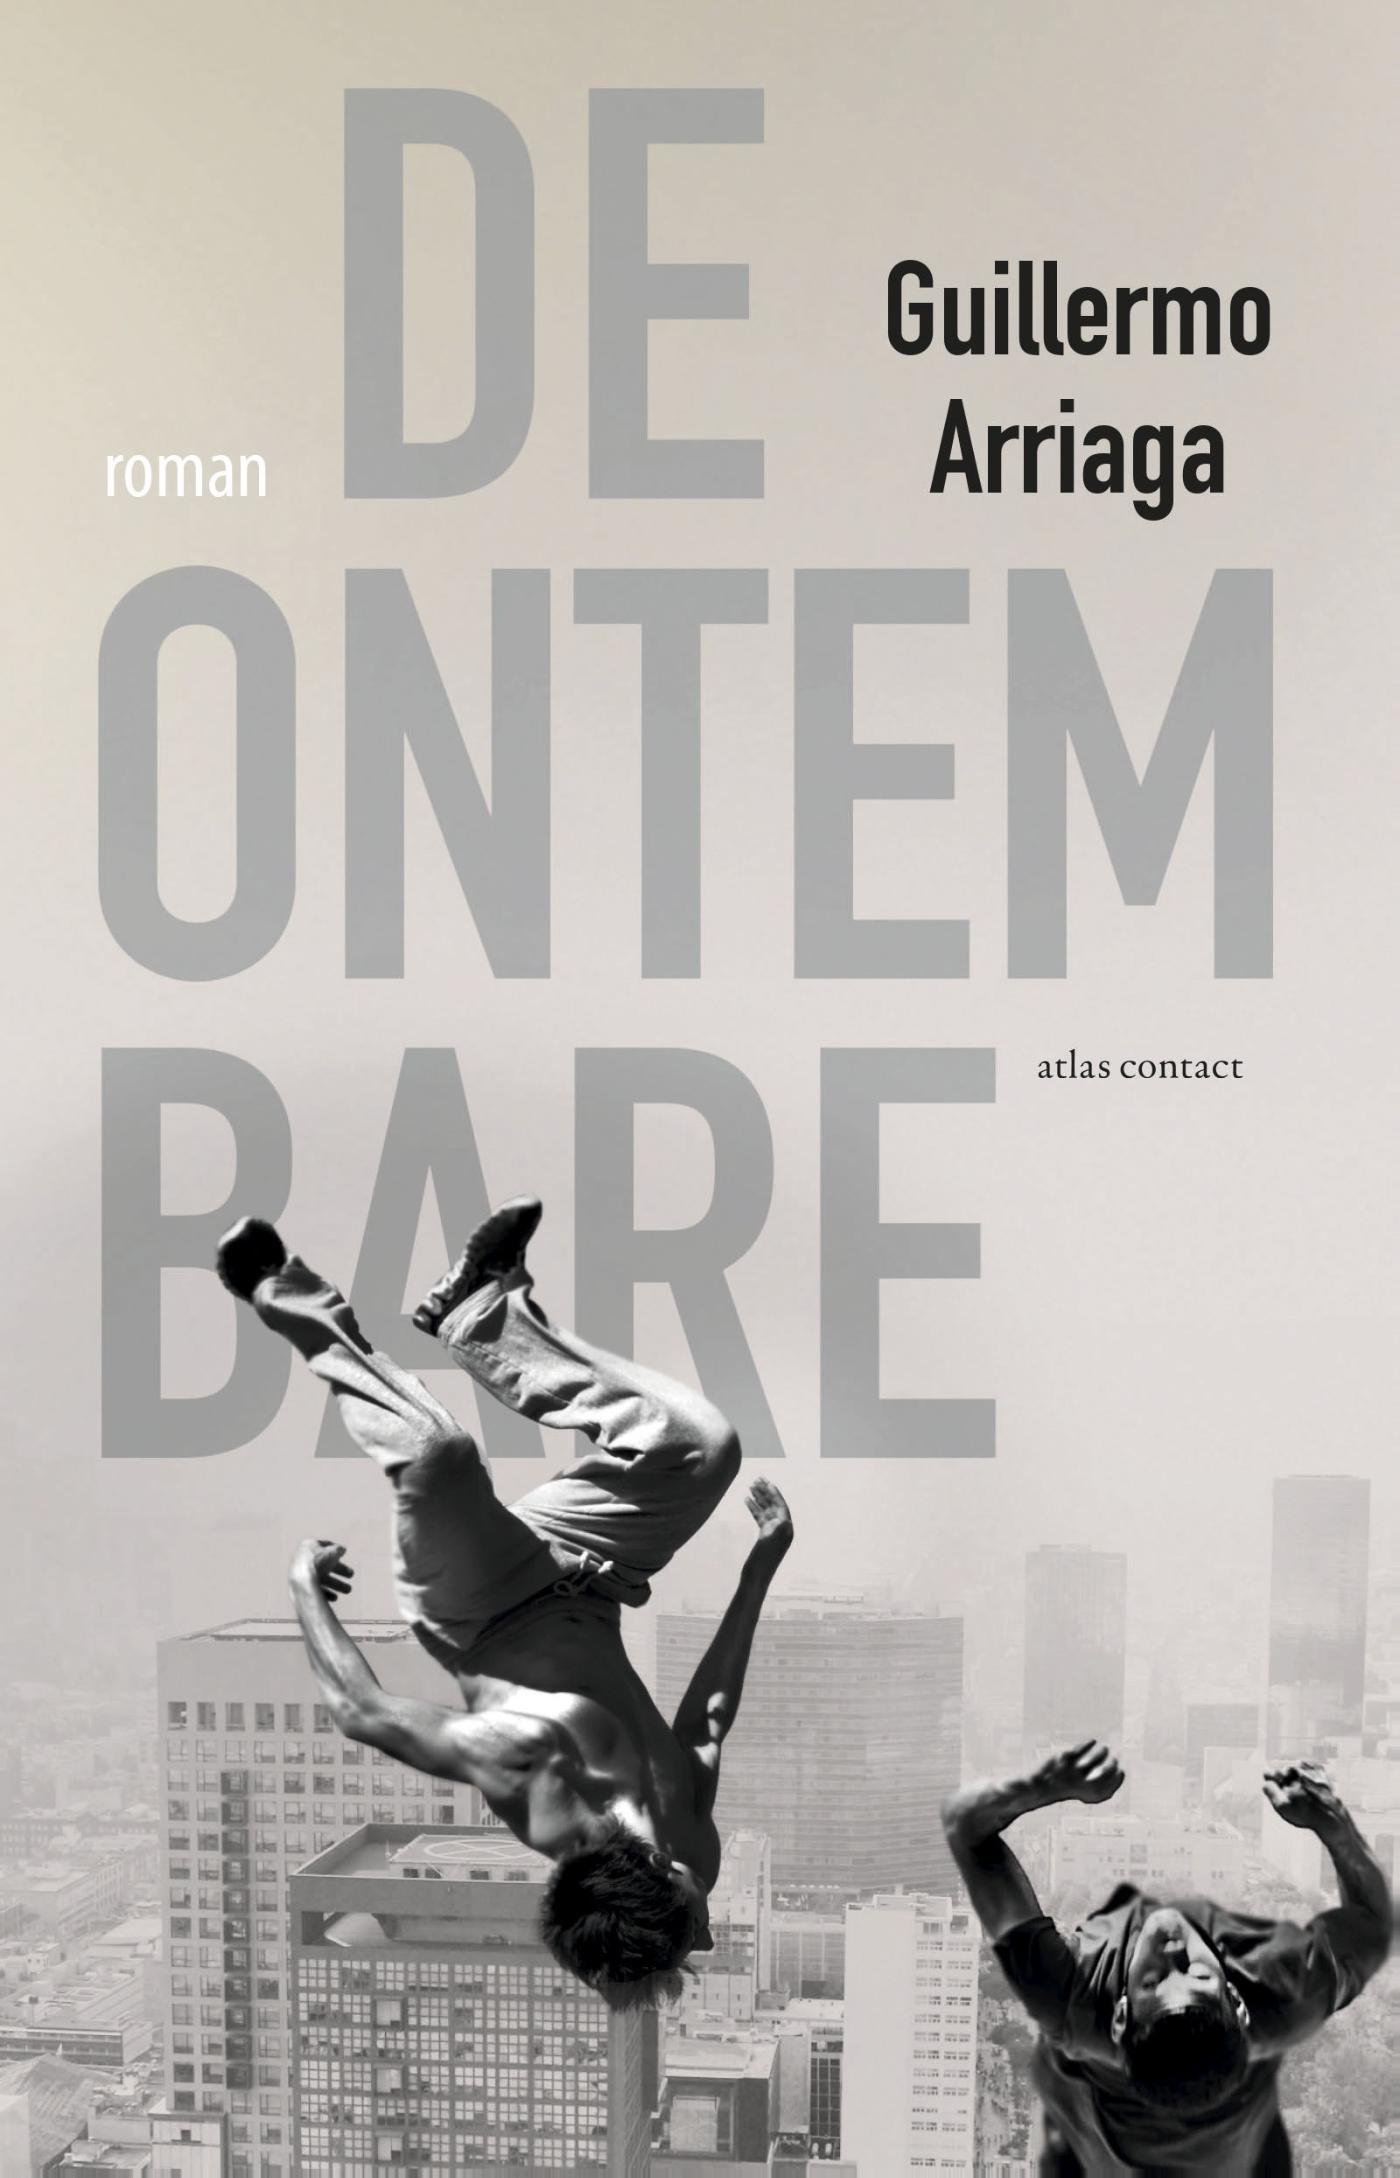 De ontembare: Amazon.es: Guillermo Arriaga: Libros en idiomas extranjeros